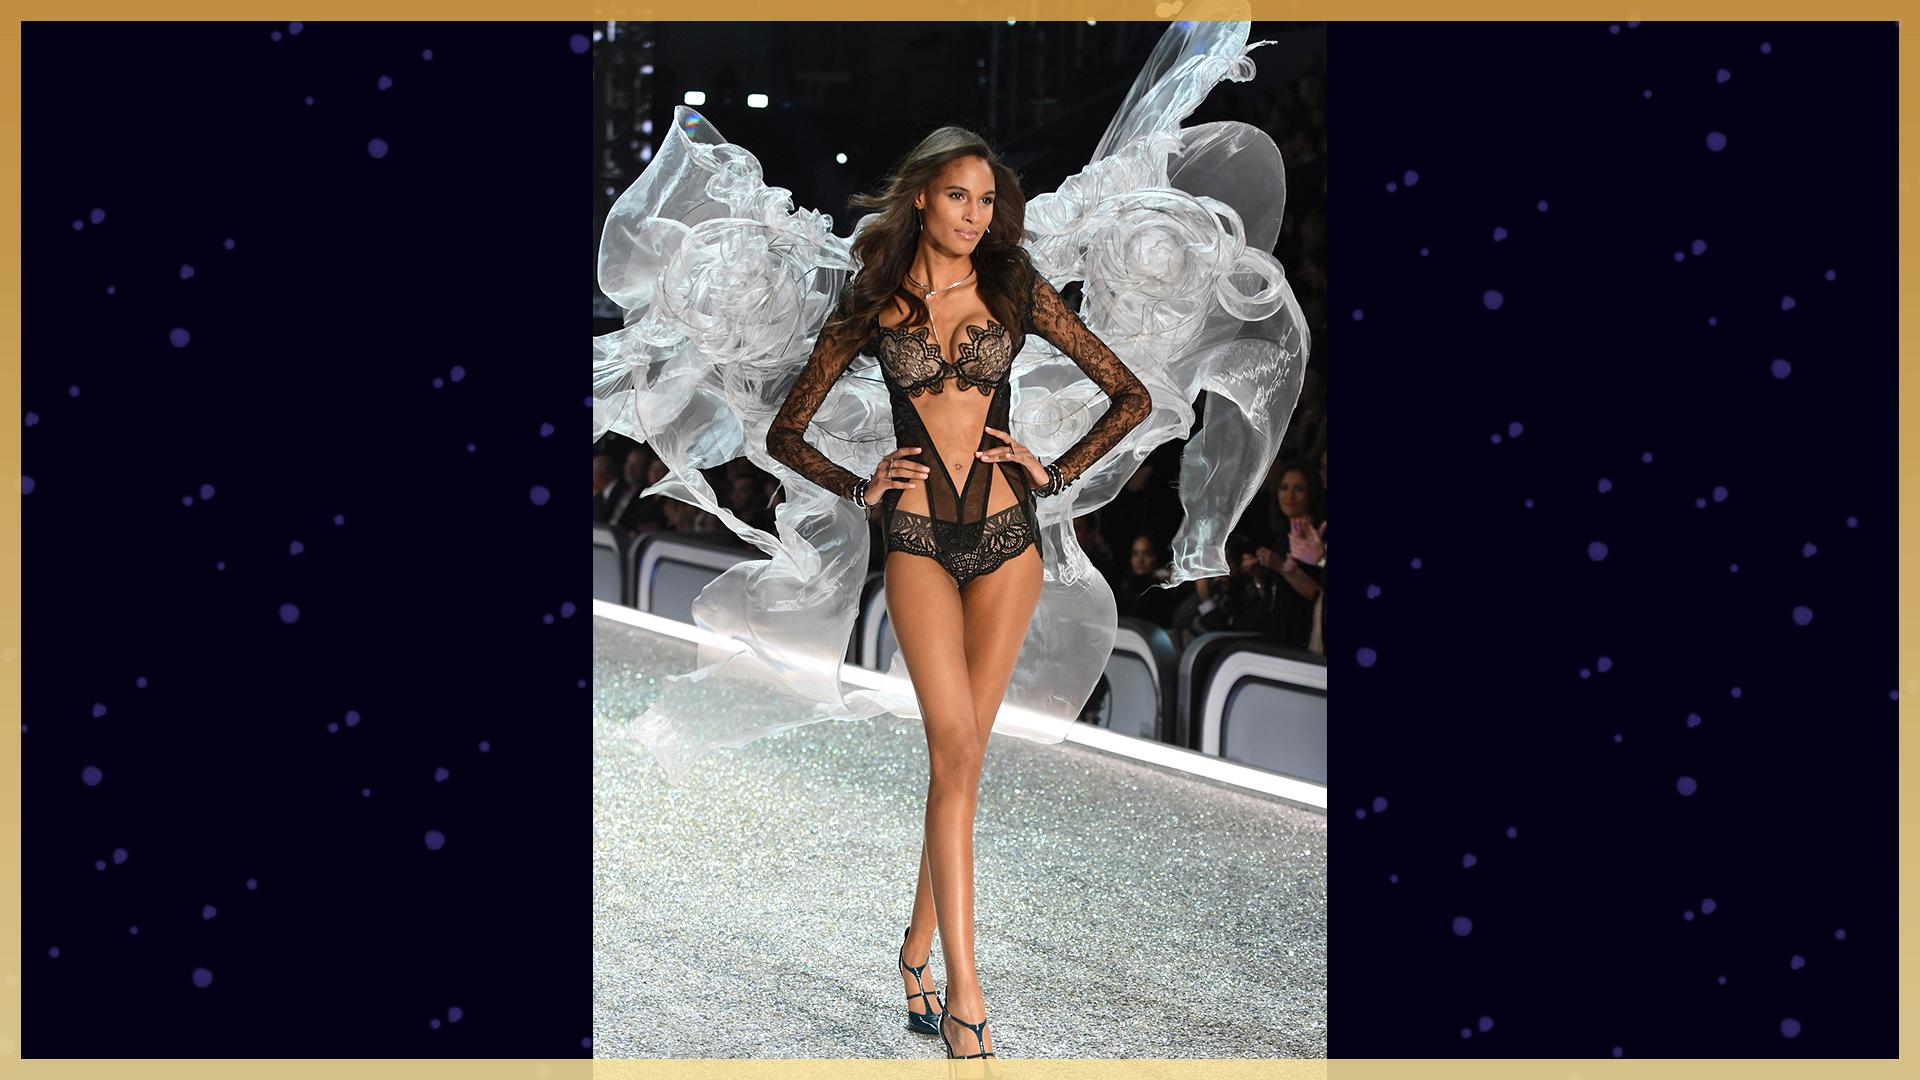 Cindy Bruna's lacey lingerie